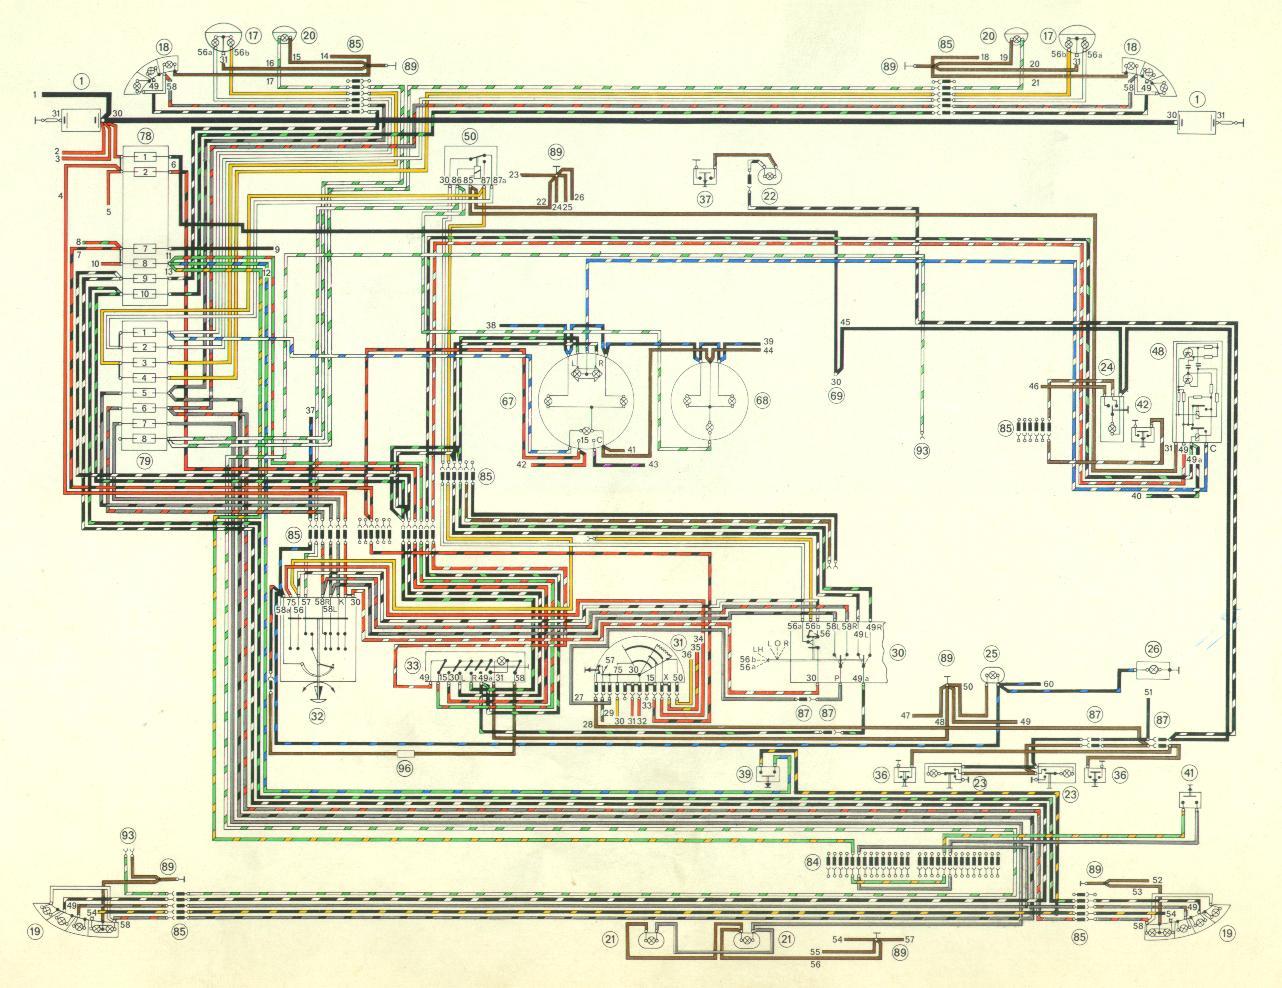 1973 porsche 911 wiring diagram - wiring diagram export bike-suitcase -  bike-suitcase.congressosifo2018.it  congressosifo2018.it